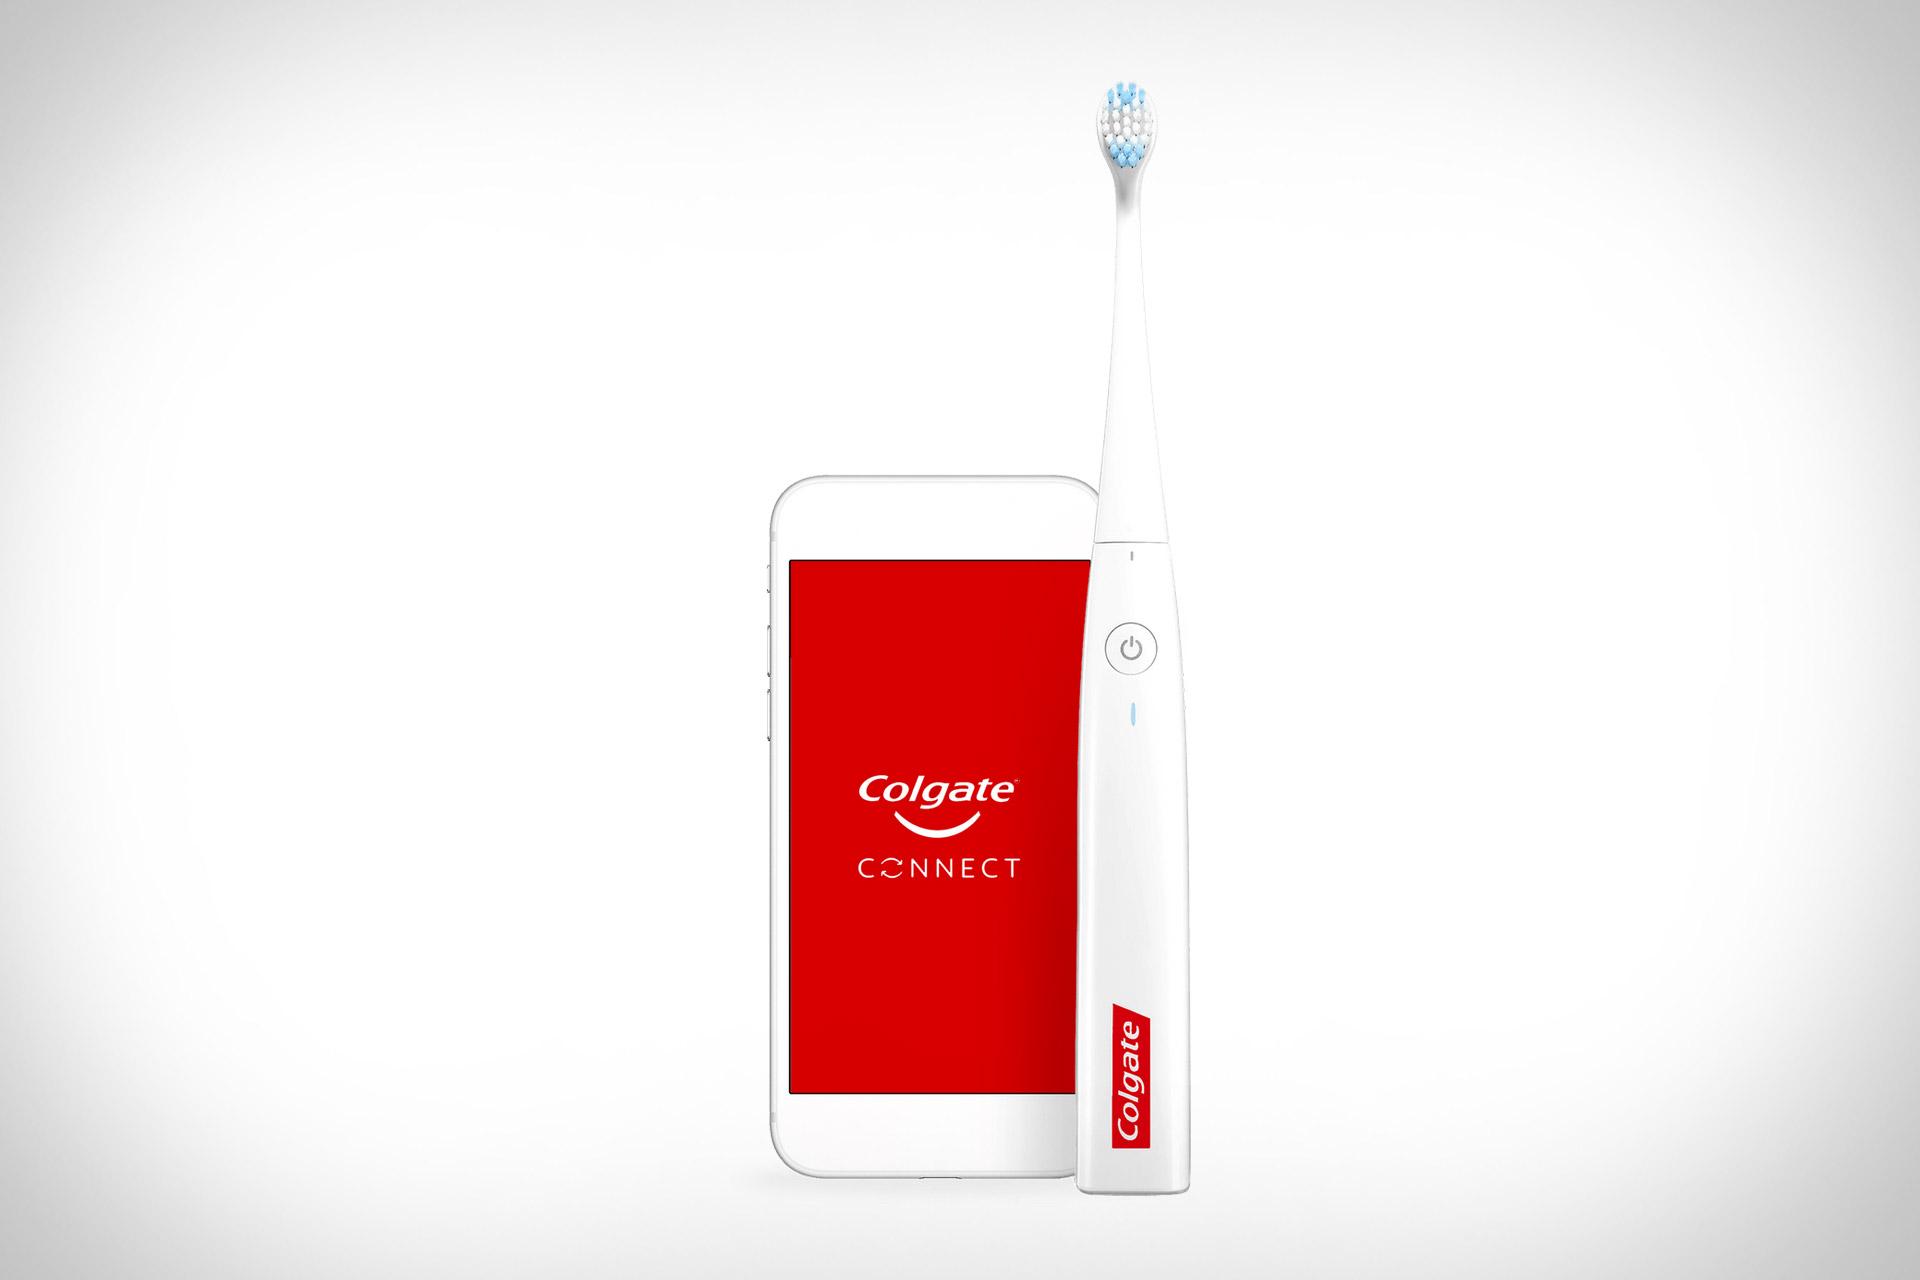 Colgate E1 Smart Toothbrush